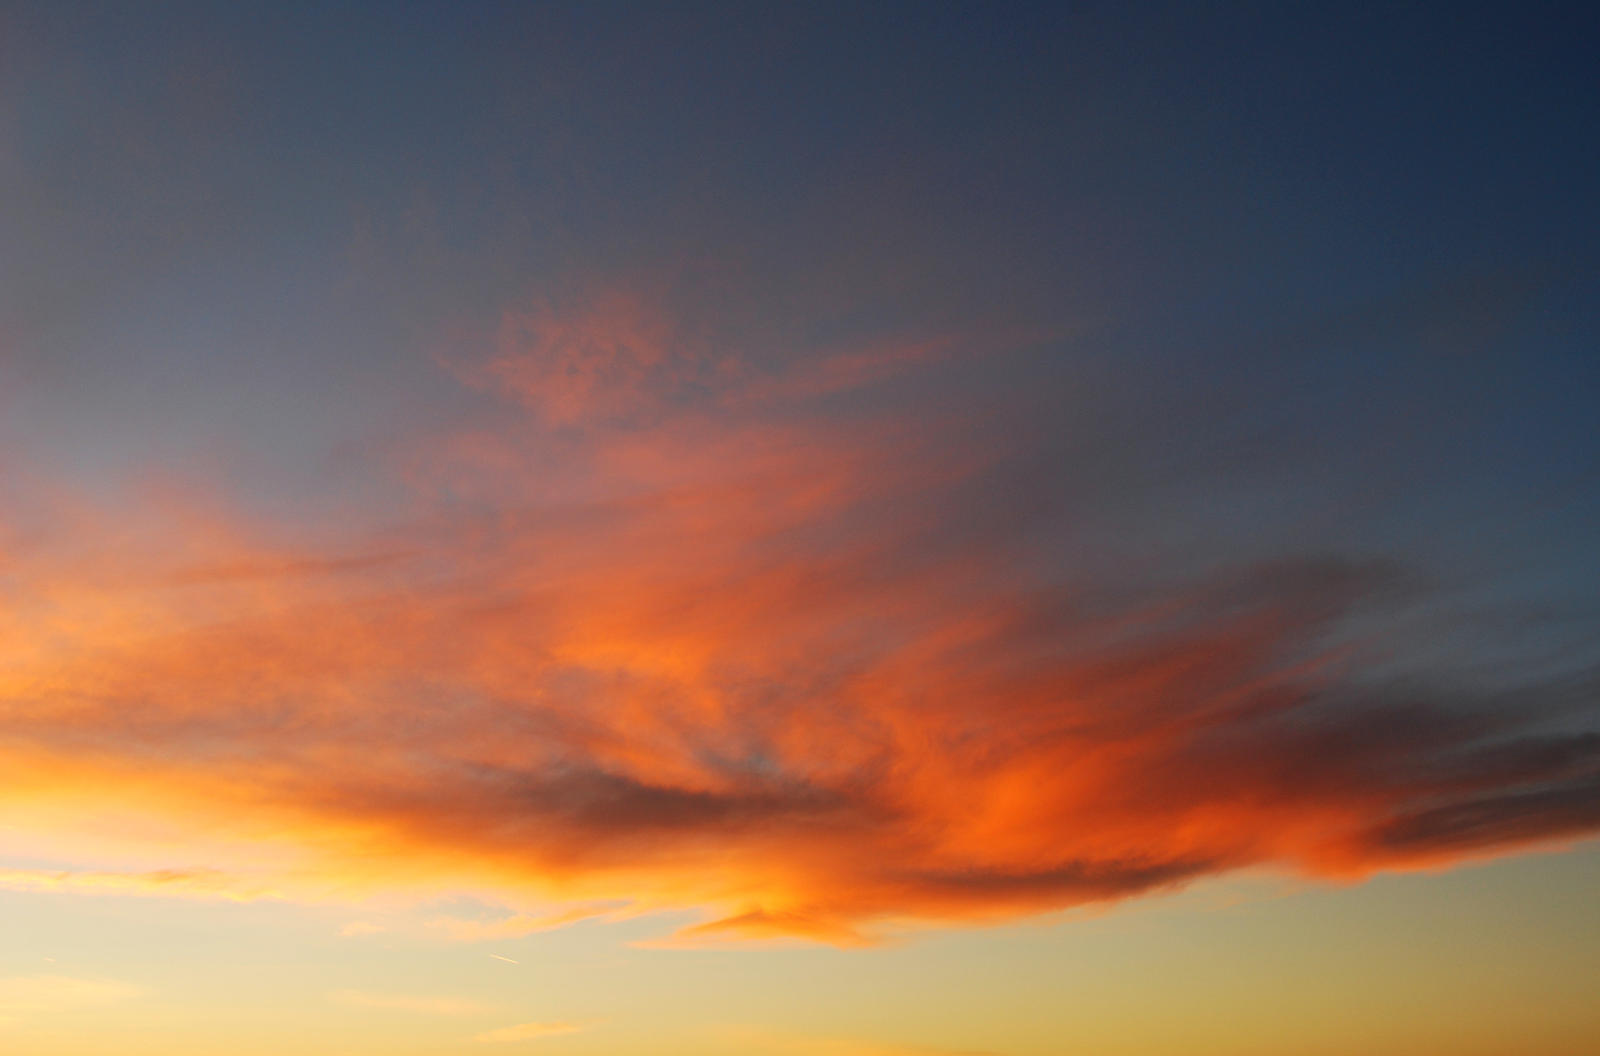 Sunset Cloud Stock 0924 by Phenix59